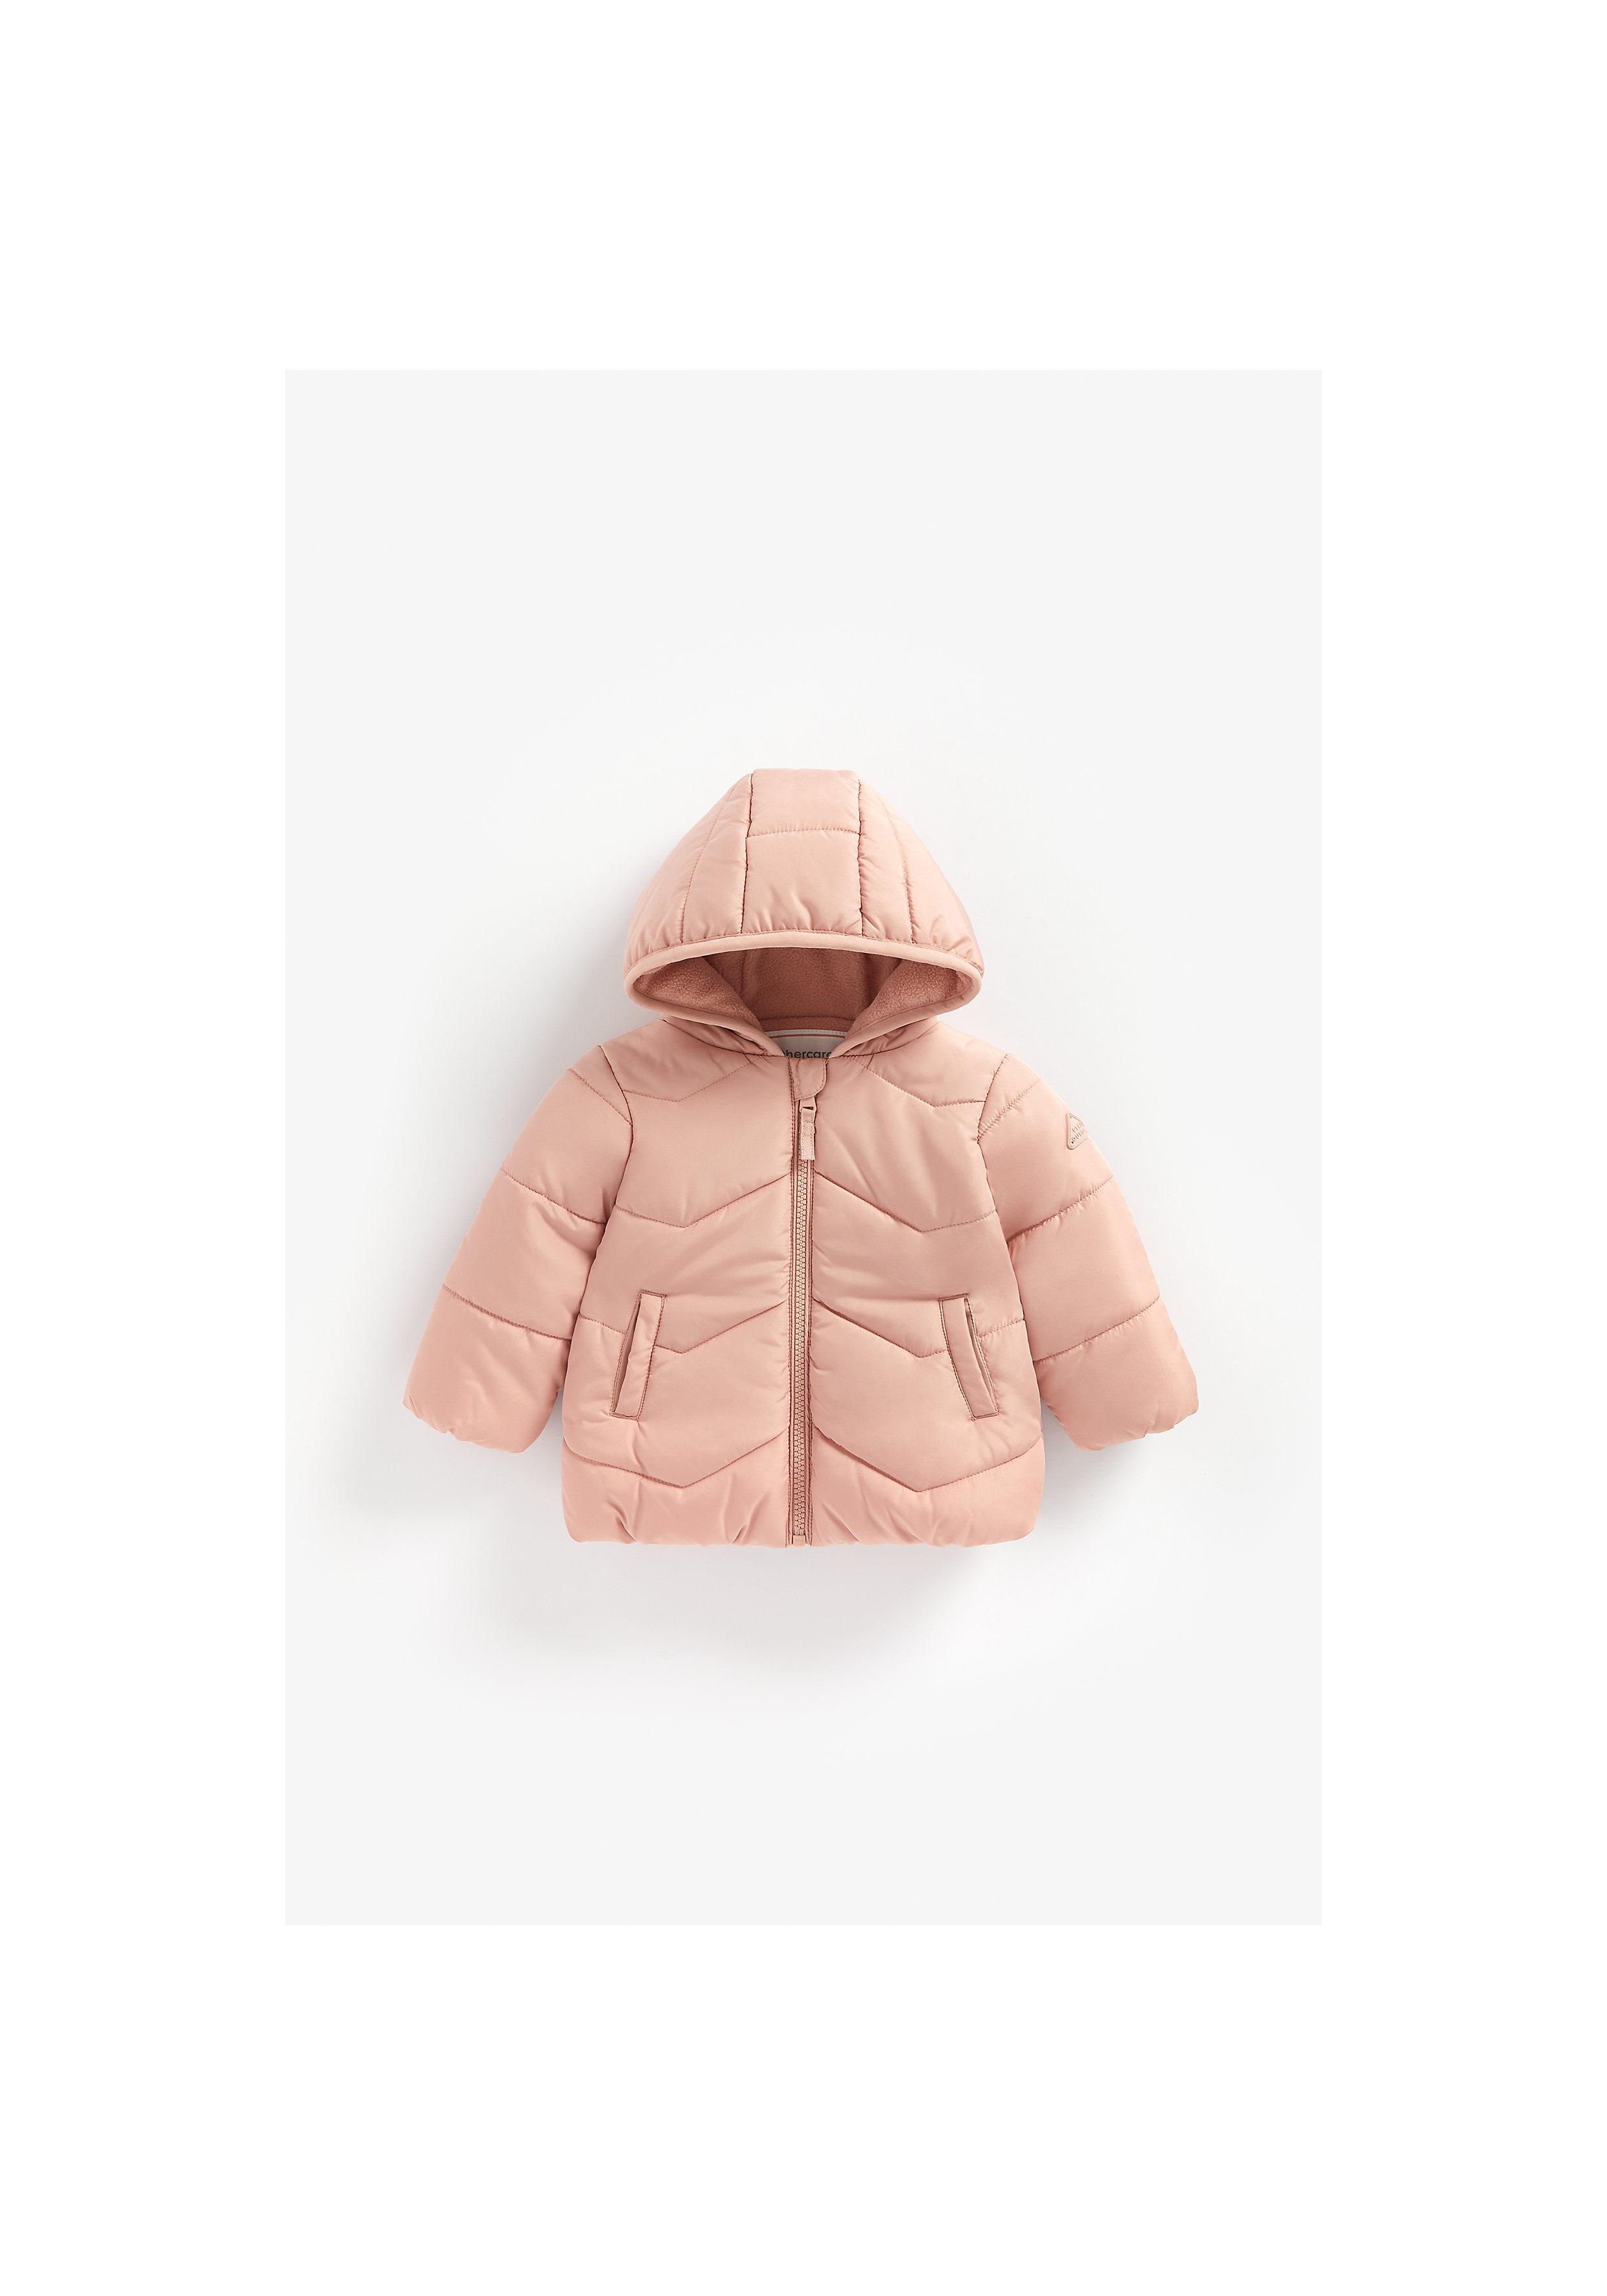 Mothercare | Girls Full Sleeves Fleece Lined Jacket Hooded - Pink